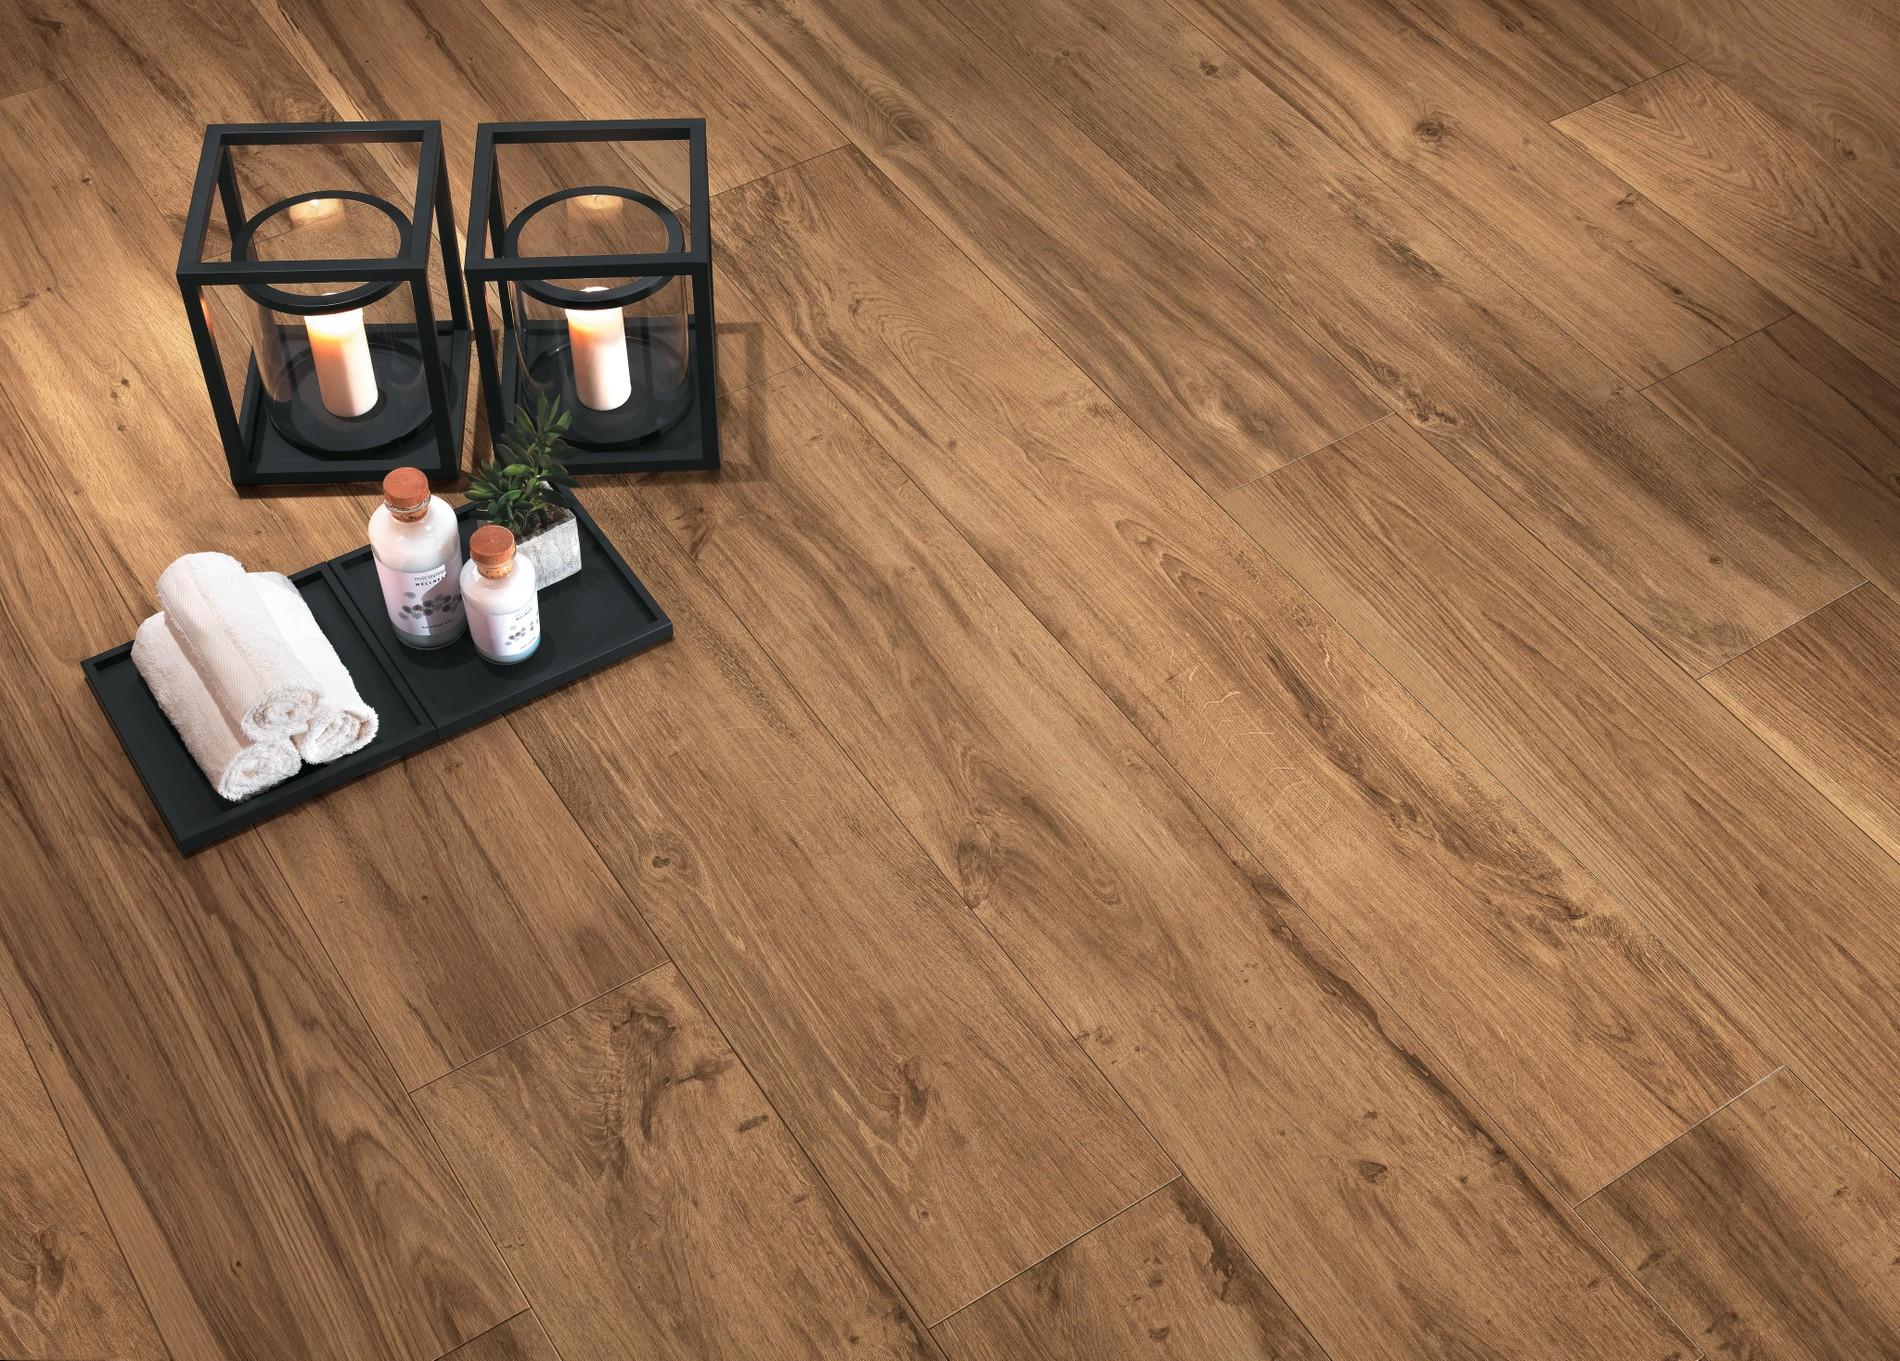 Wood-look porcelain tiles